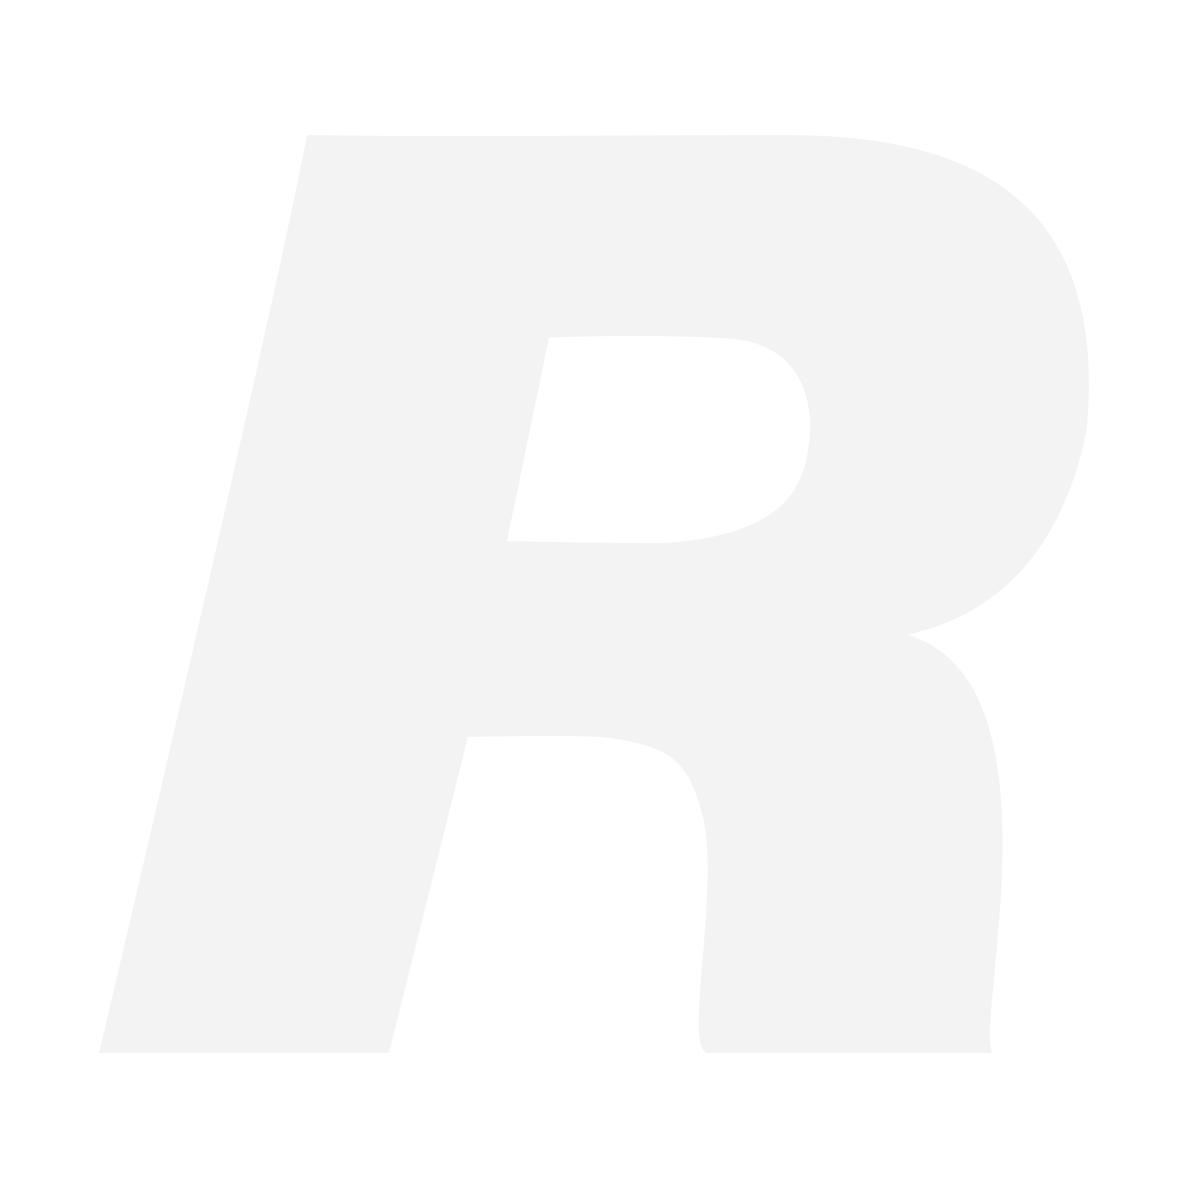 Sony Beredskapsväska LCJ-RXB (till RX1)